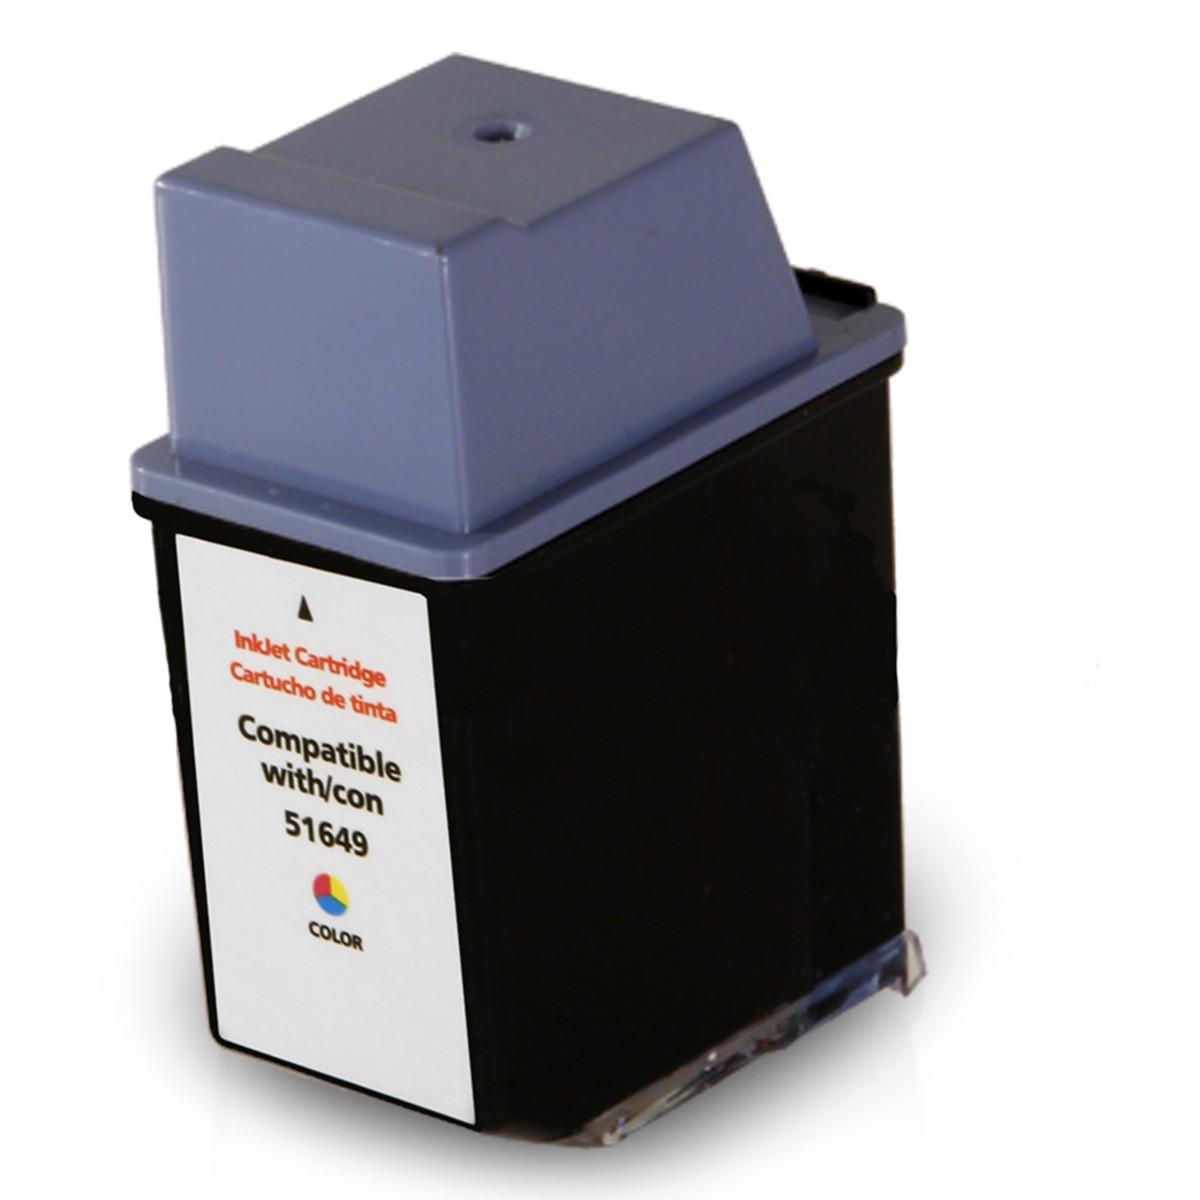 Cartucho de Tinta Compatível com HP 49 51649A Colorido | Deskjet 350 Officejet 500 PSC-370 | 21ml